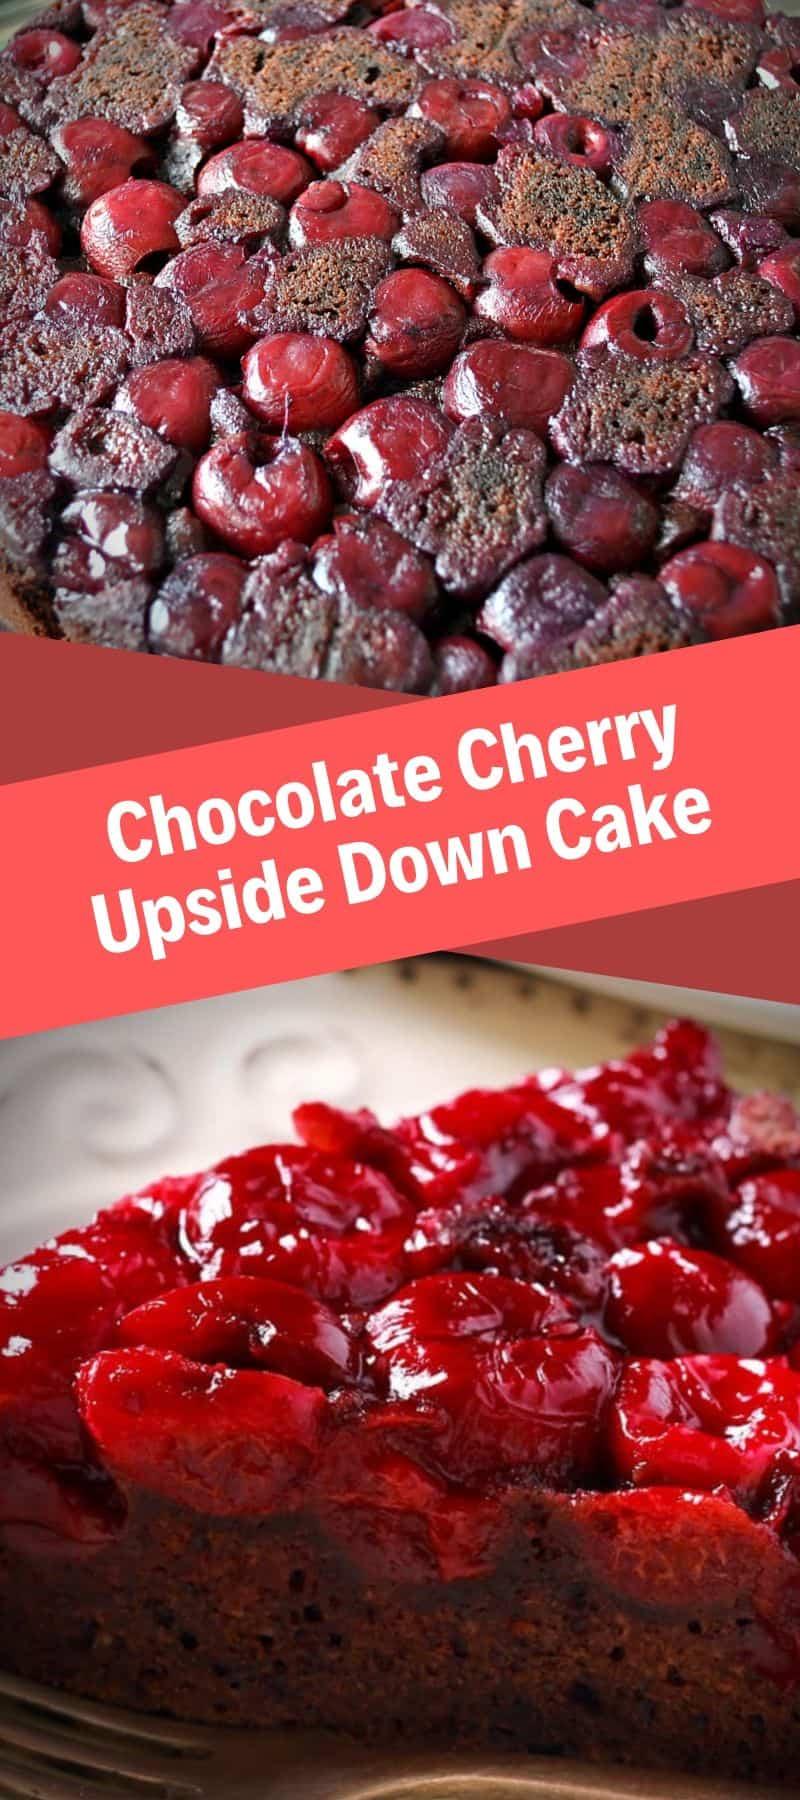 Chocolate Cherry Upside Down Cake Recipe 3